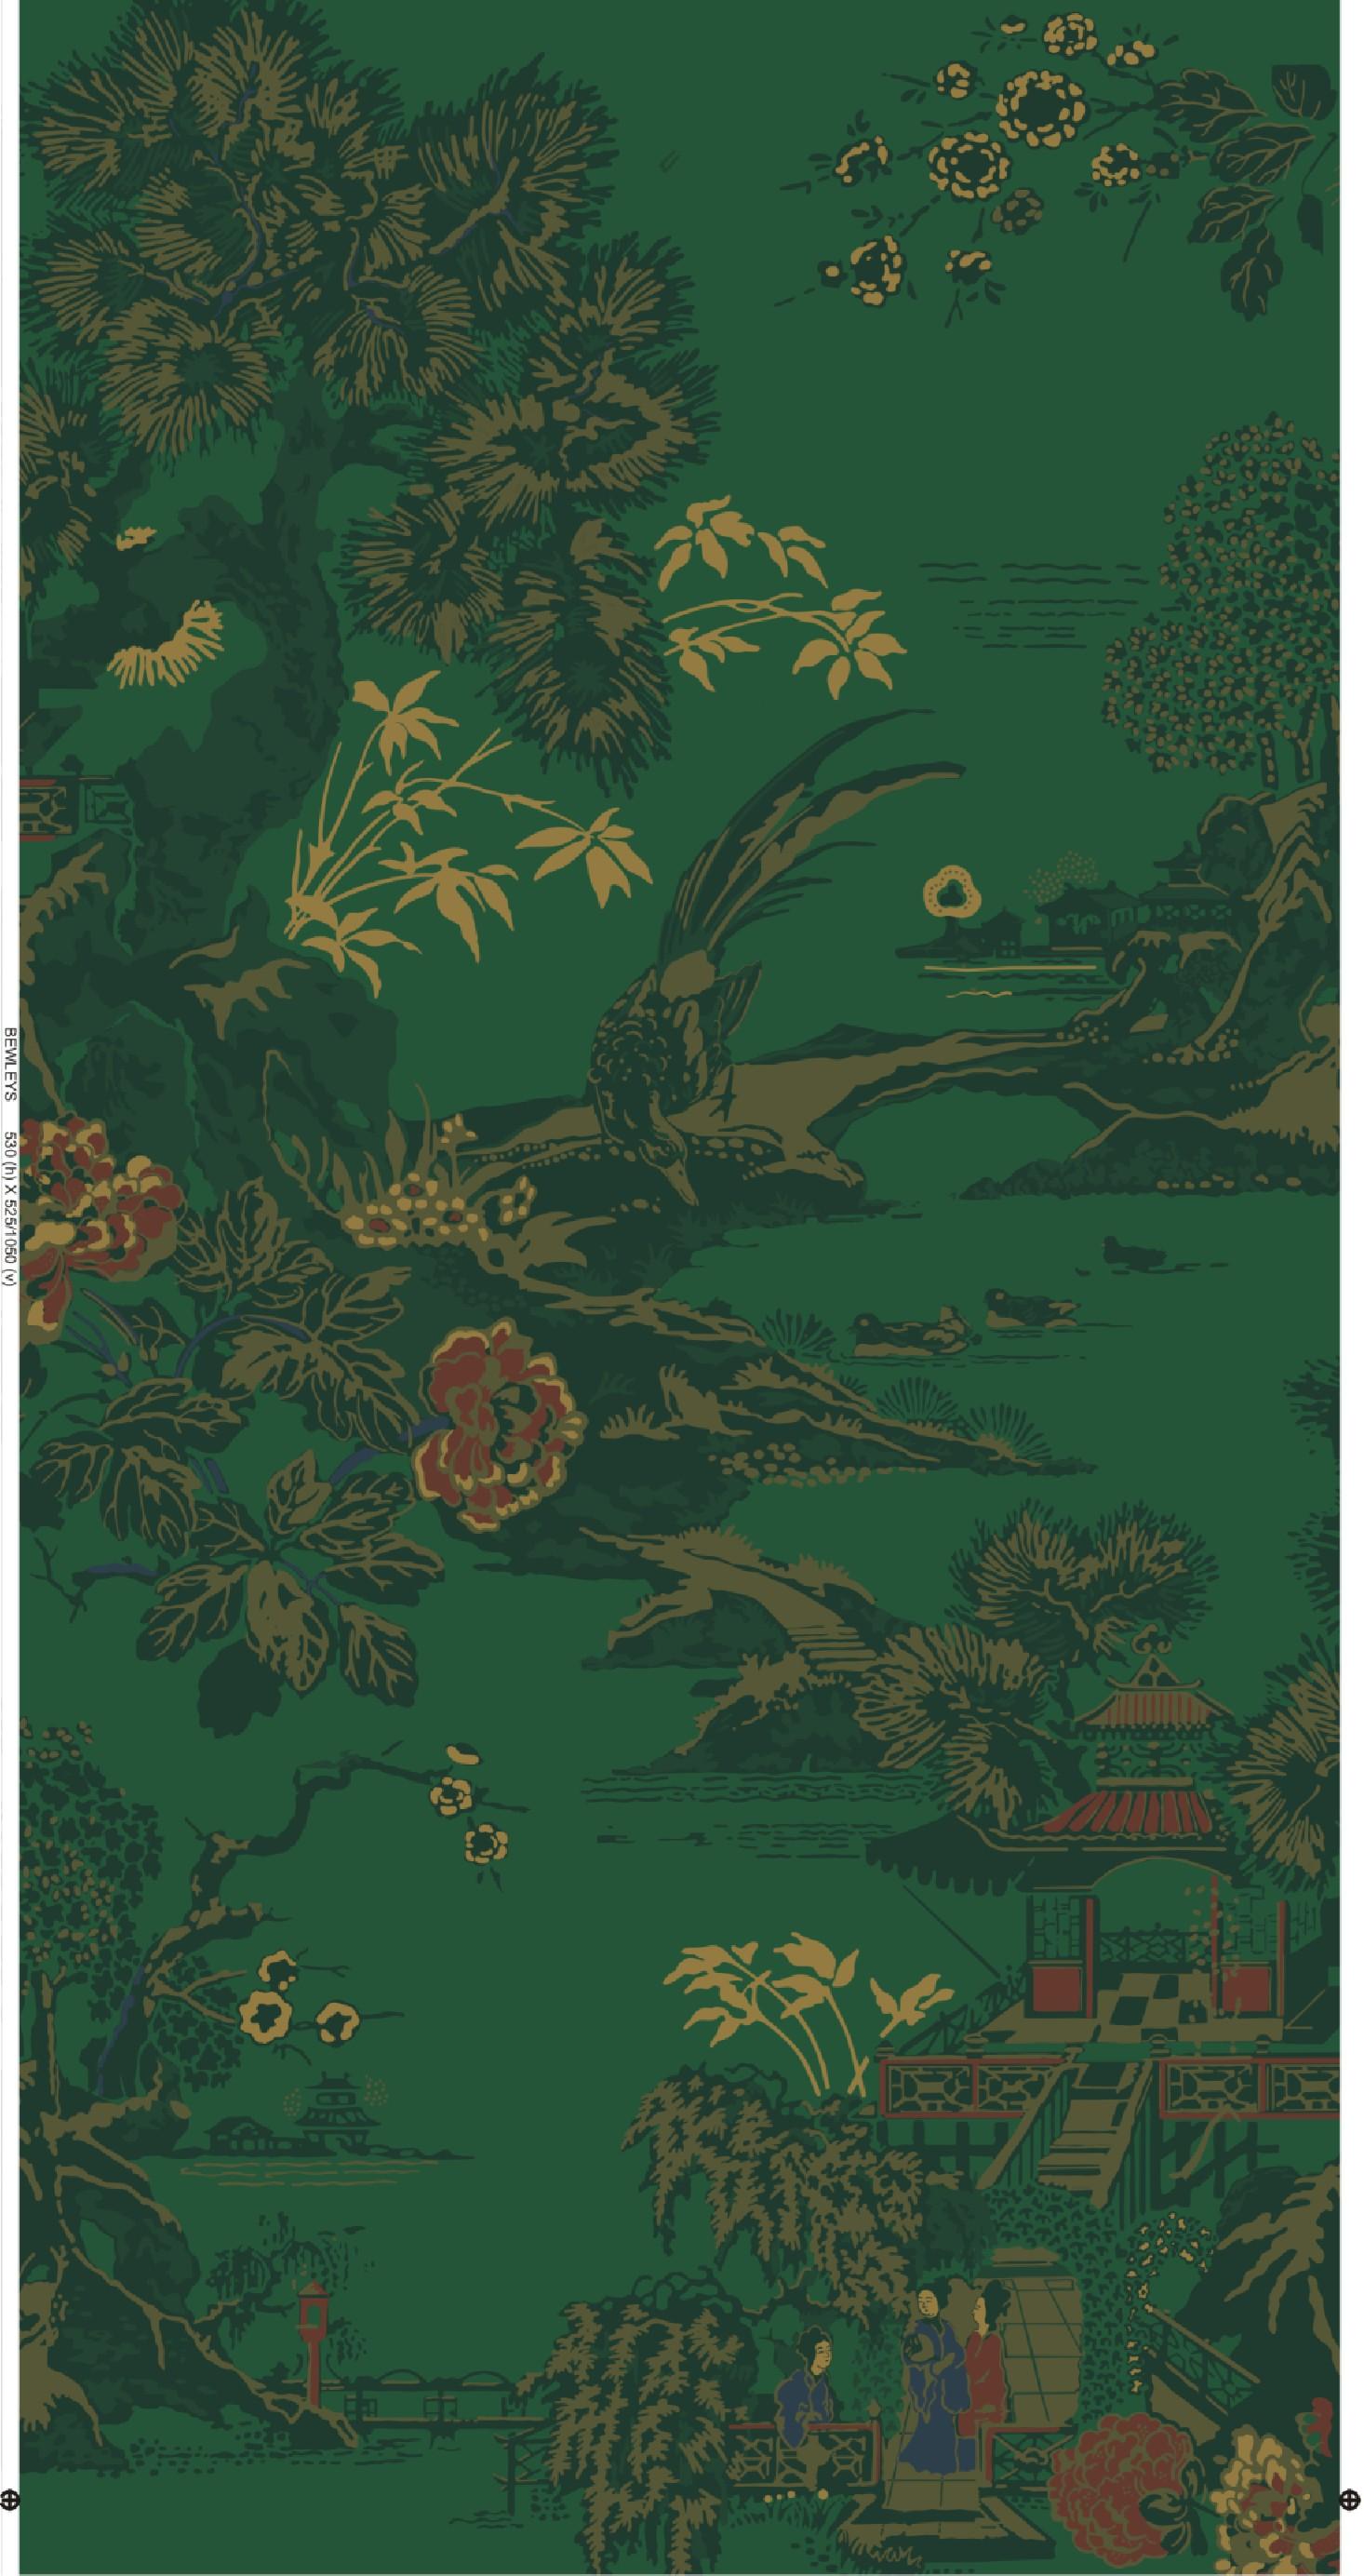 [16+] Green Aesthetics Wallpapers on WallpaperSafari